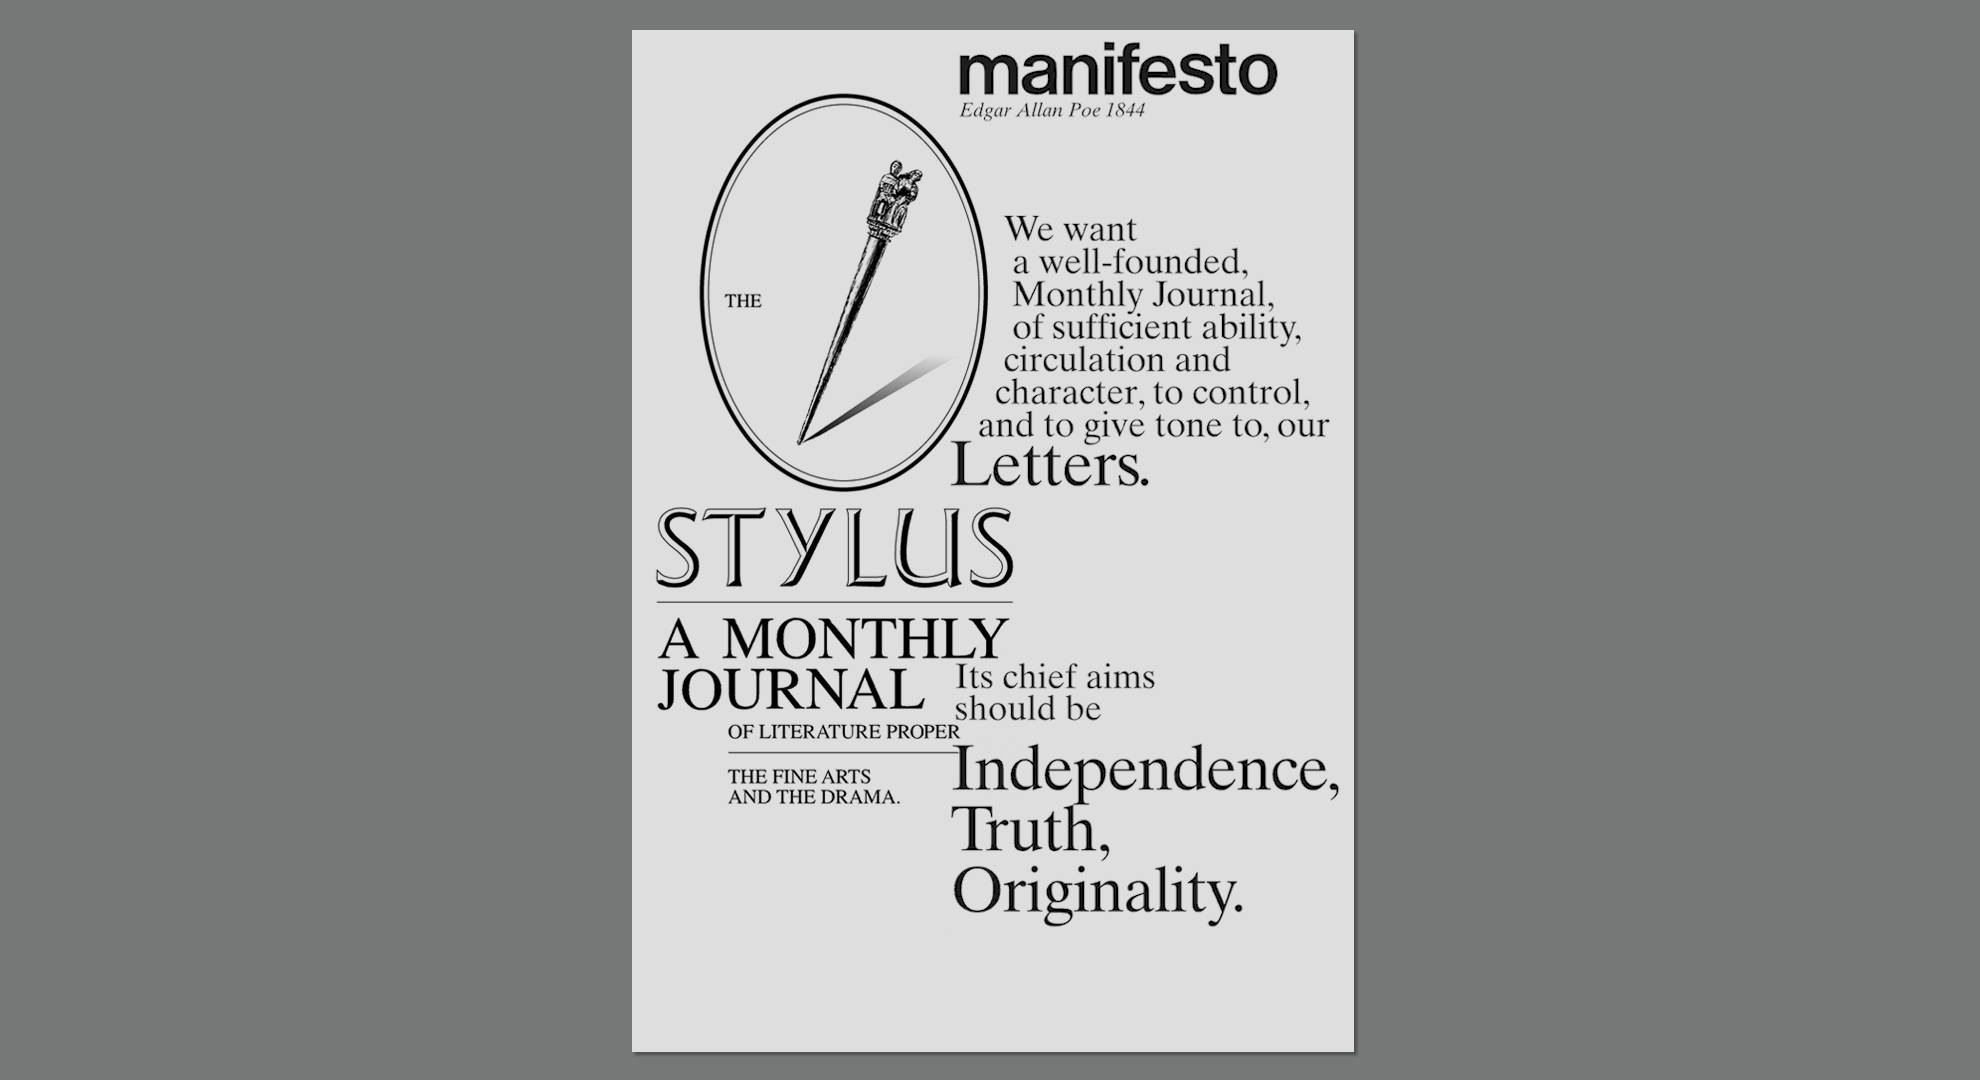 stylus3.jpg